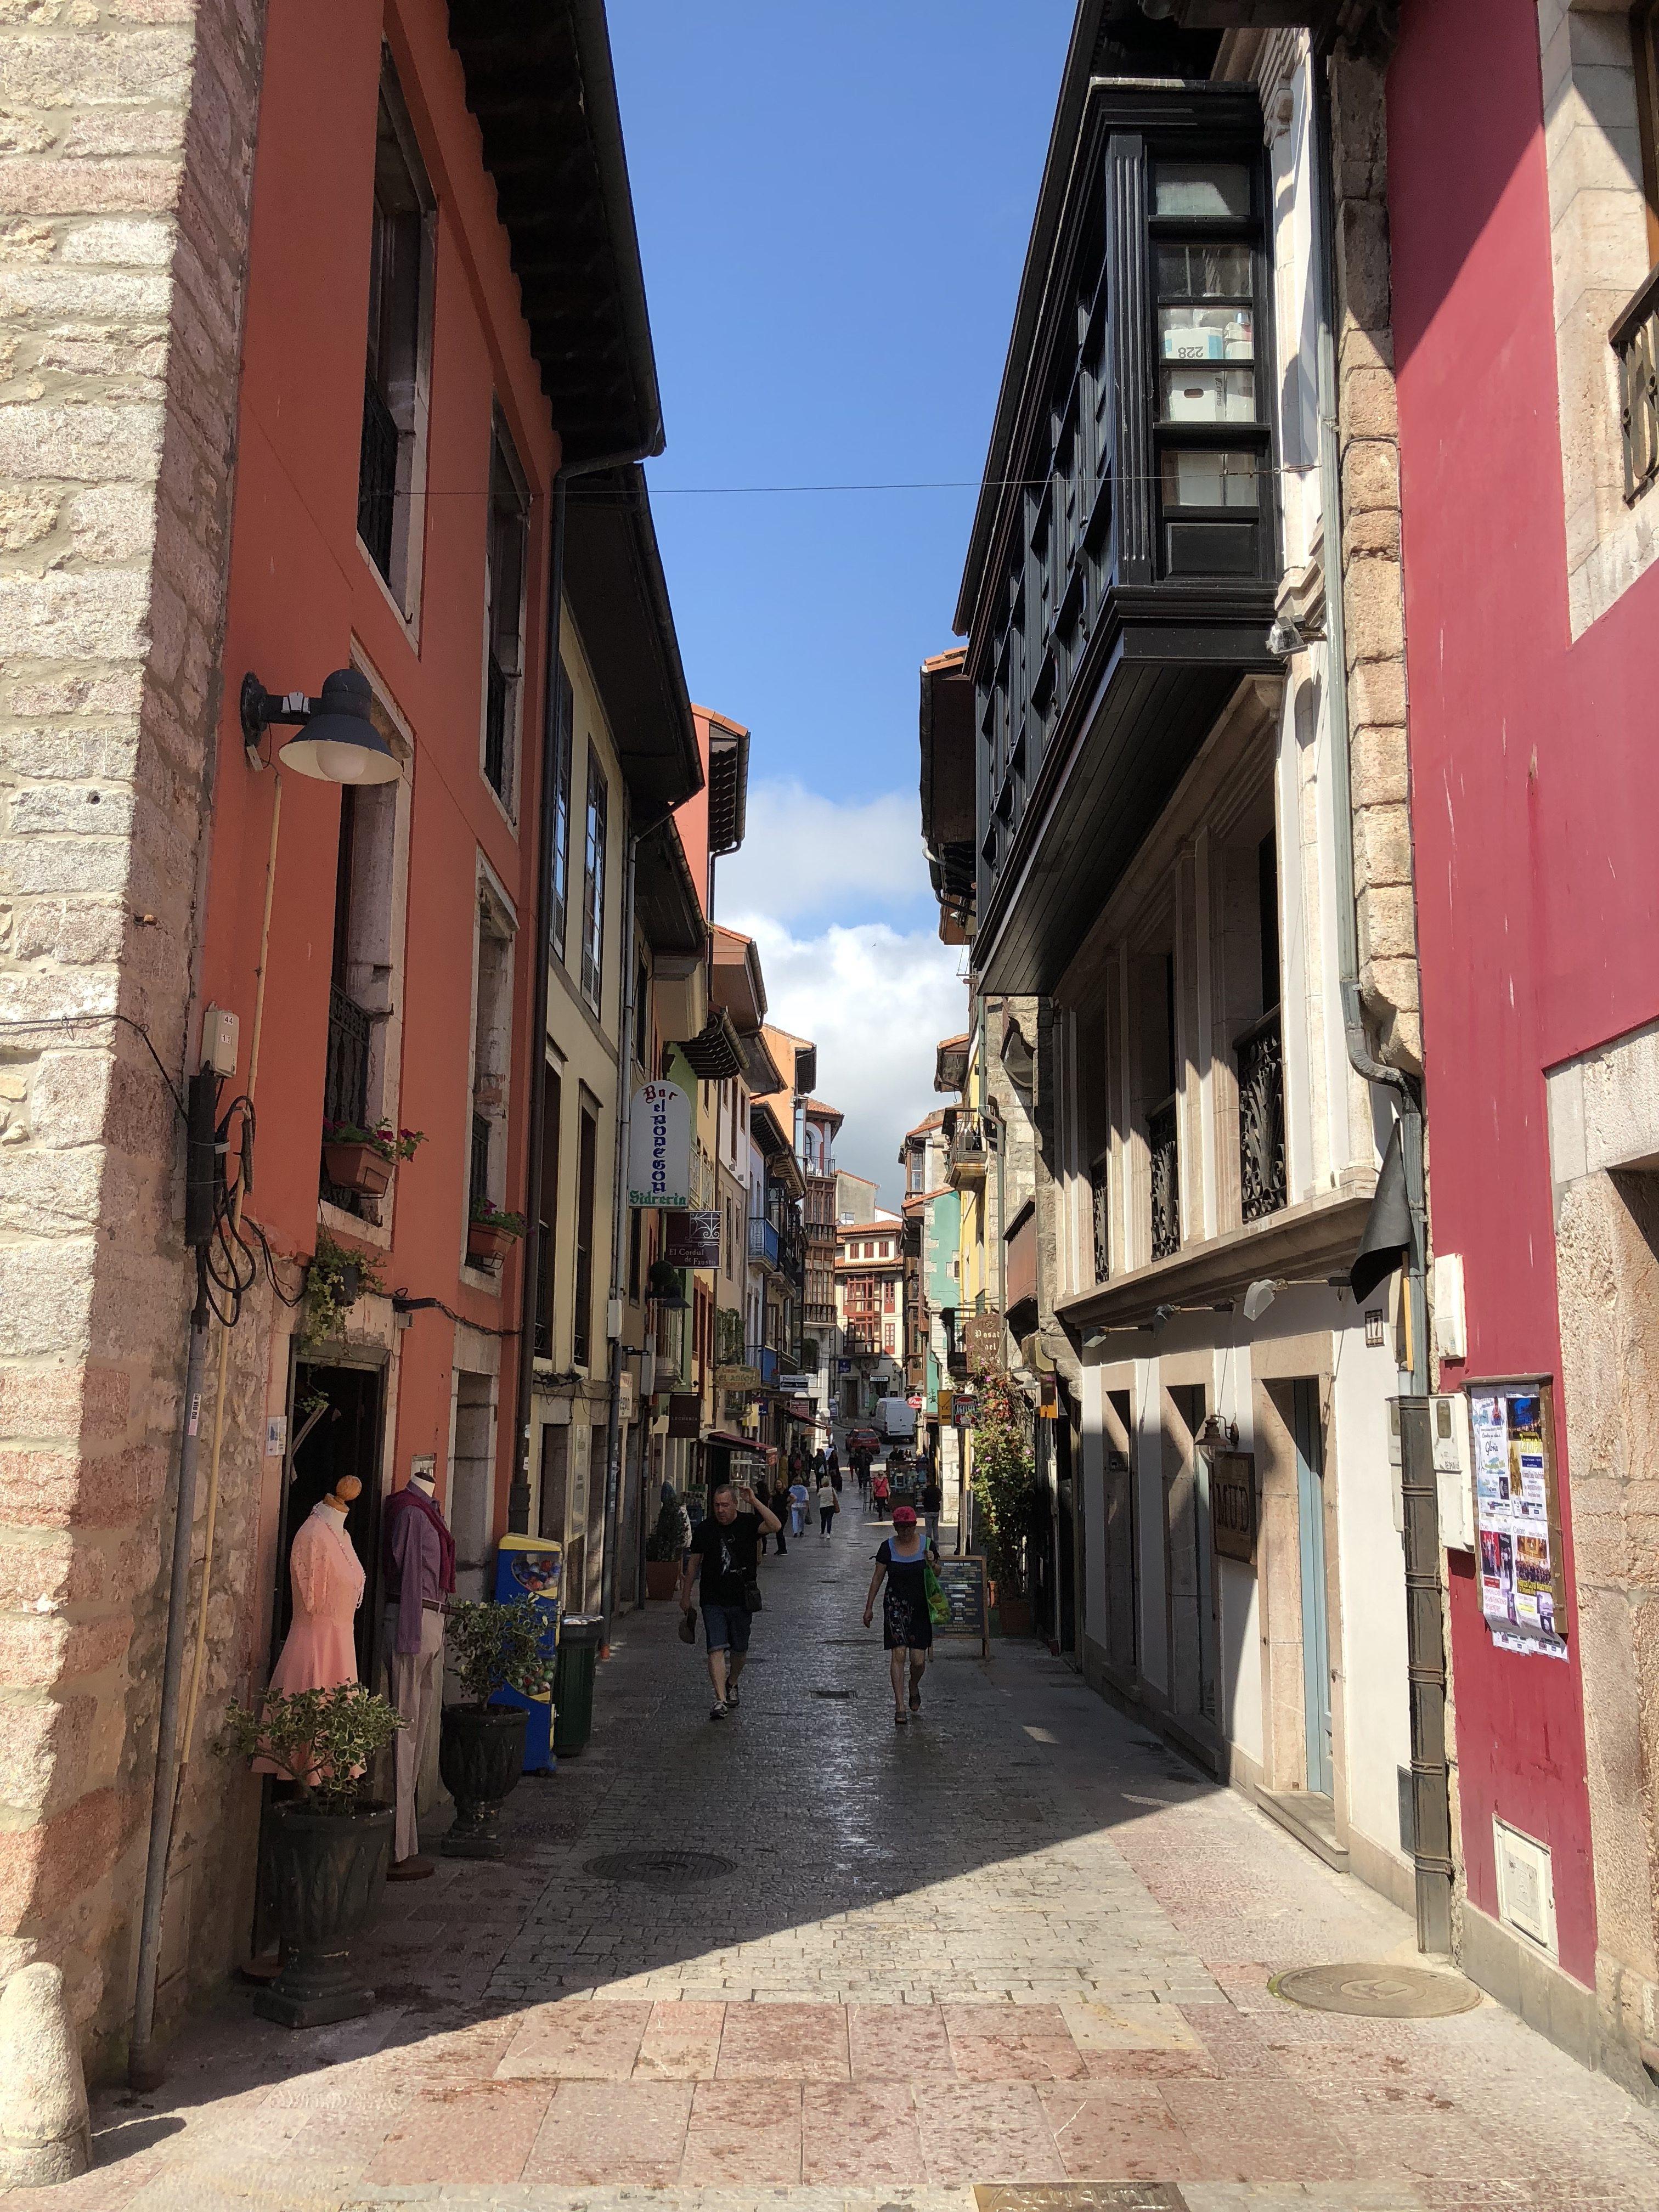 Narrow street in llanes